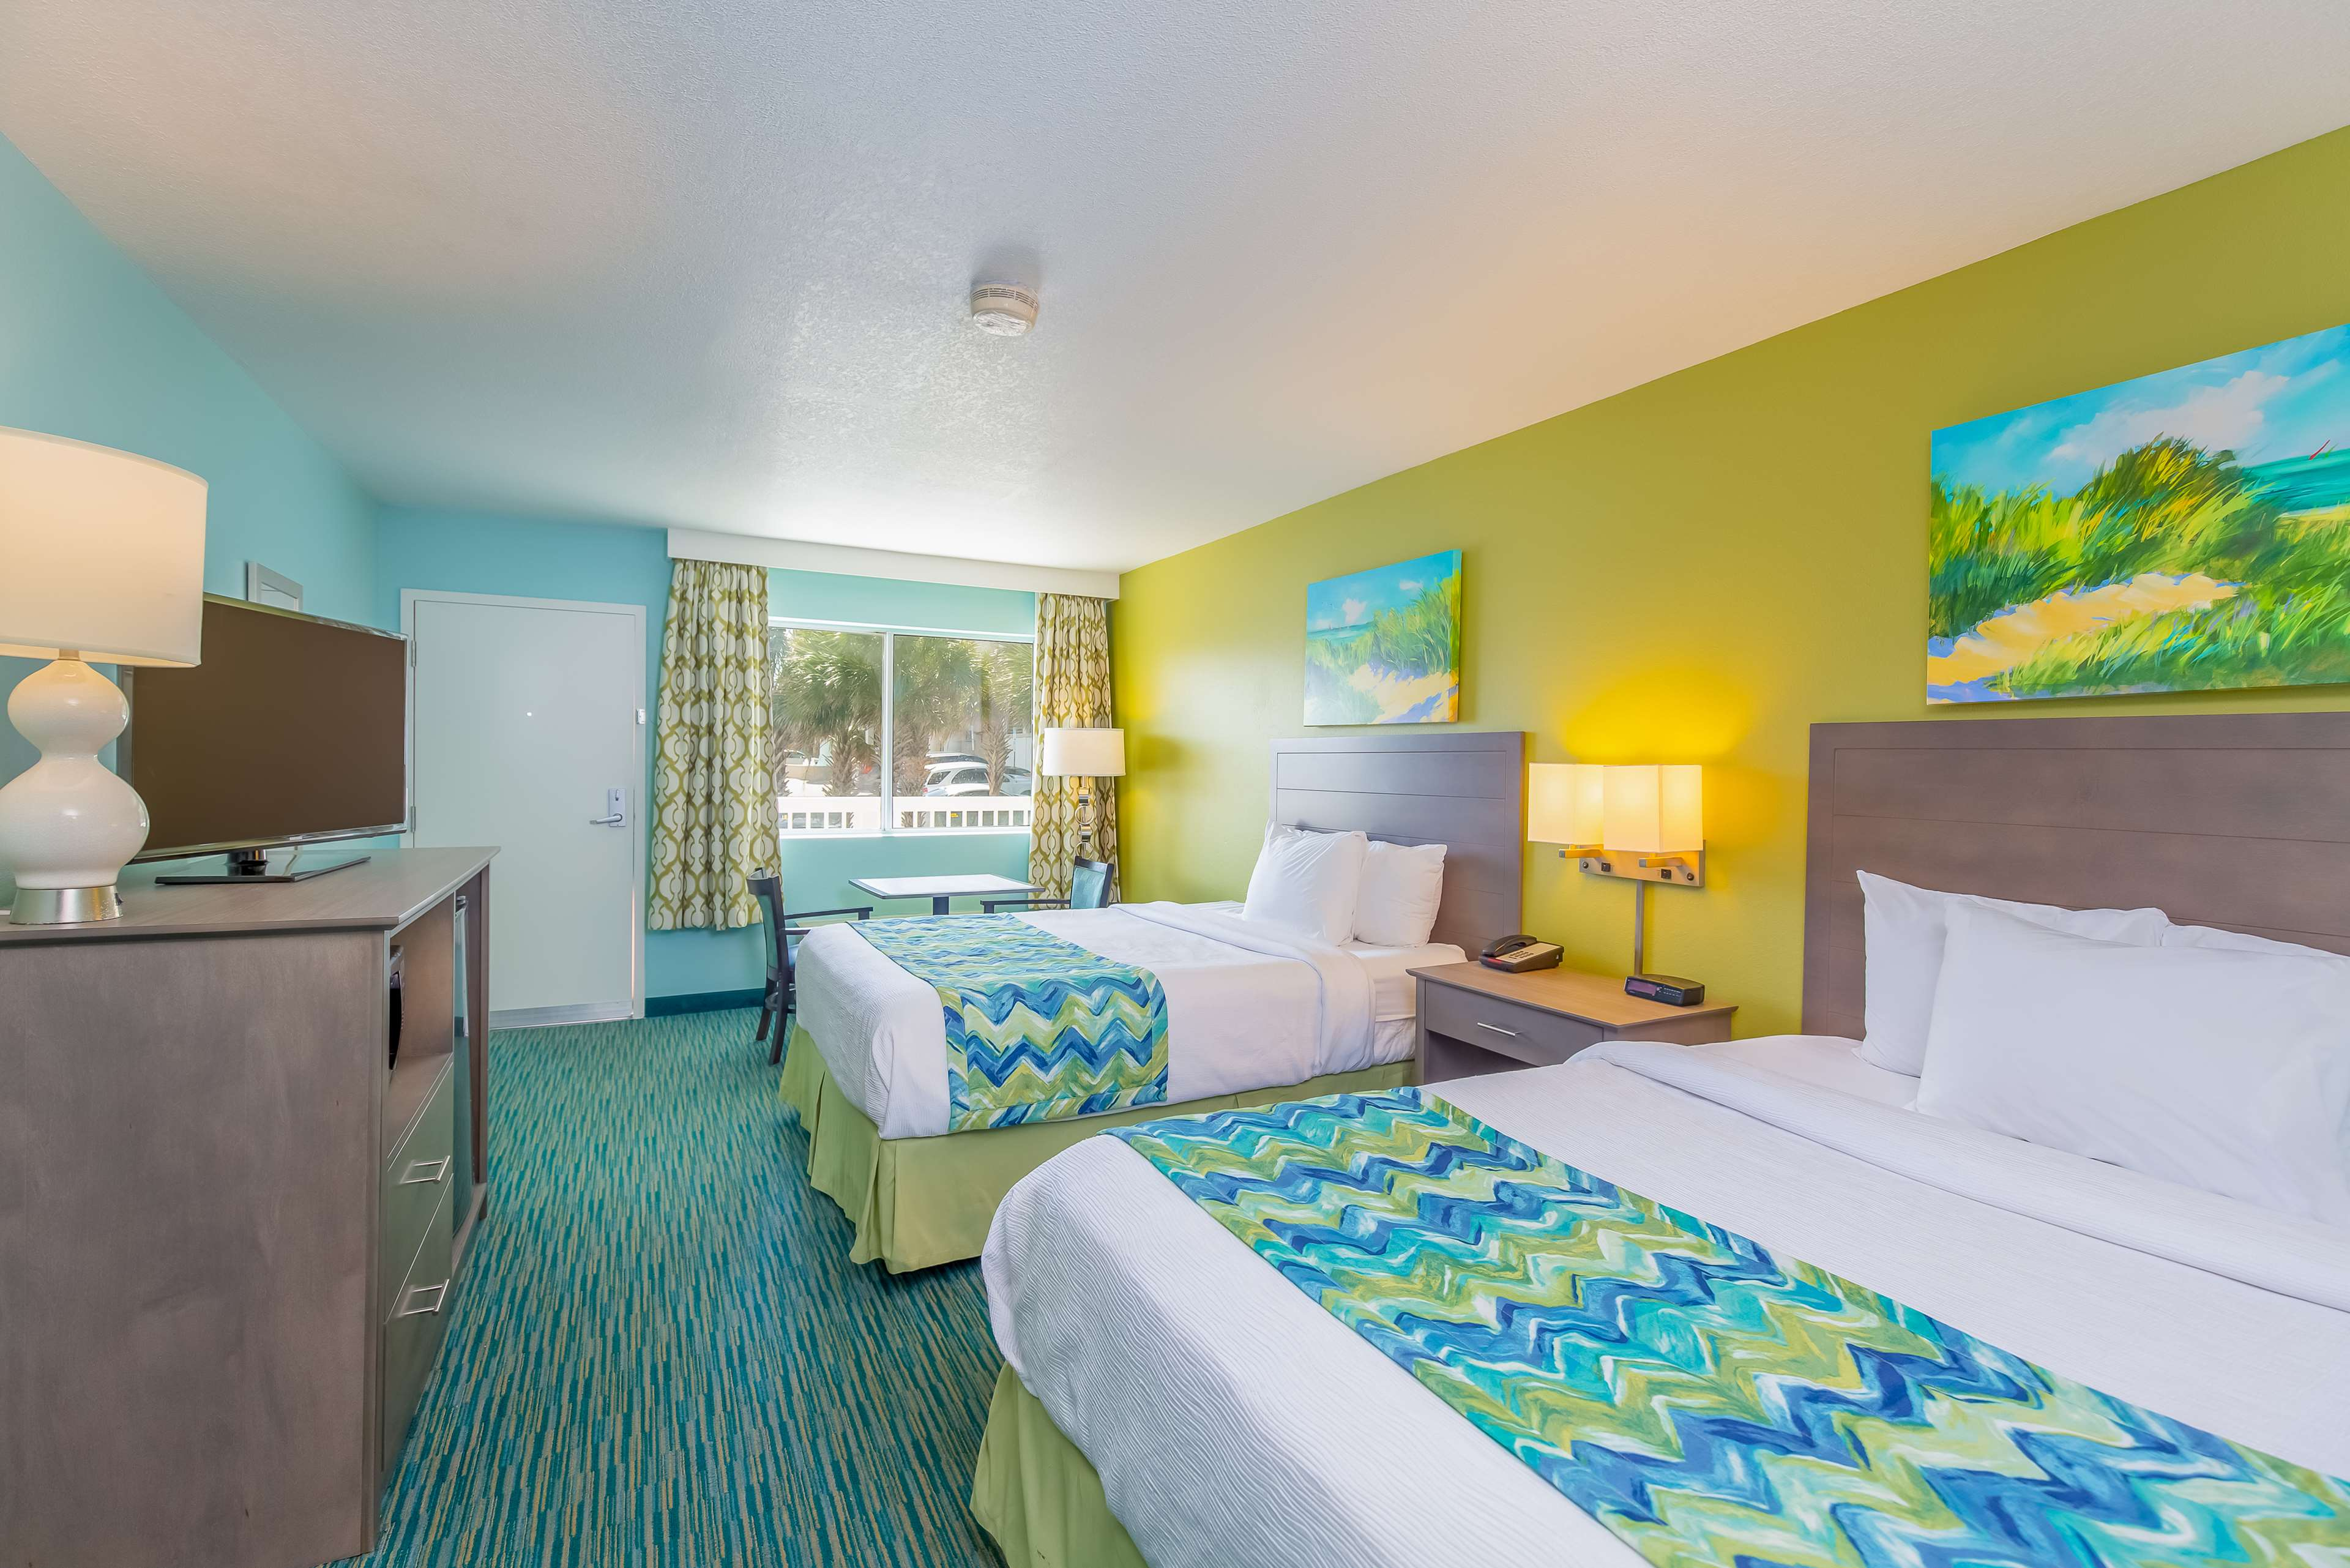 Best Western Beachside Resort image 14